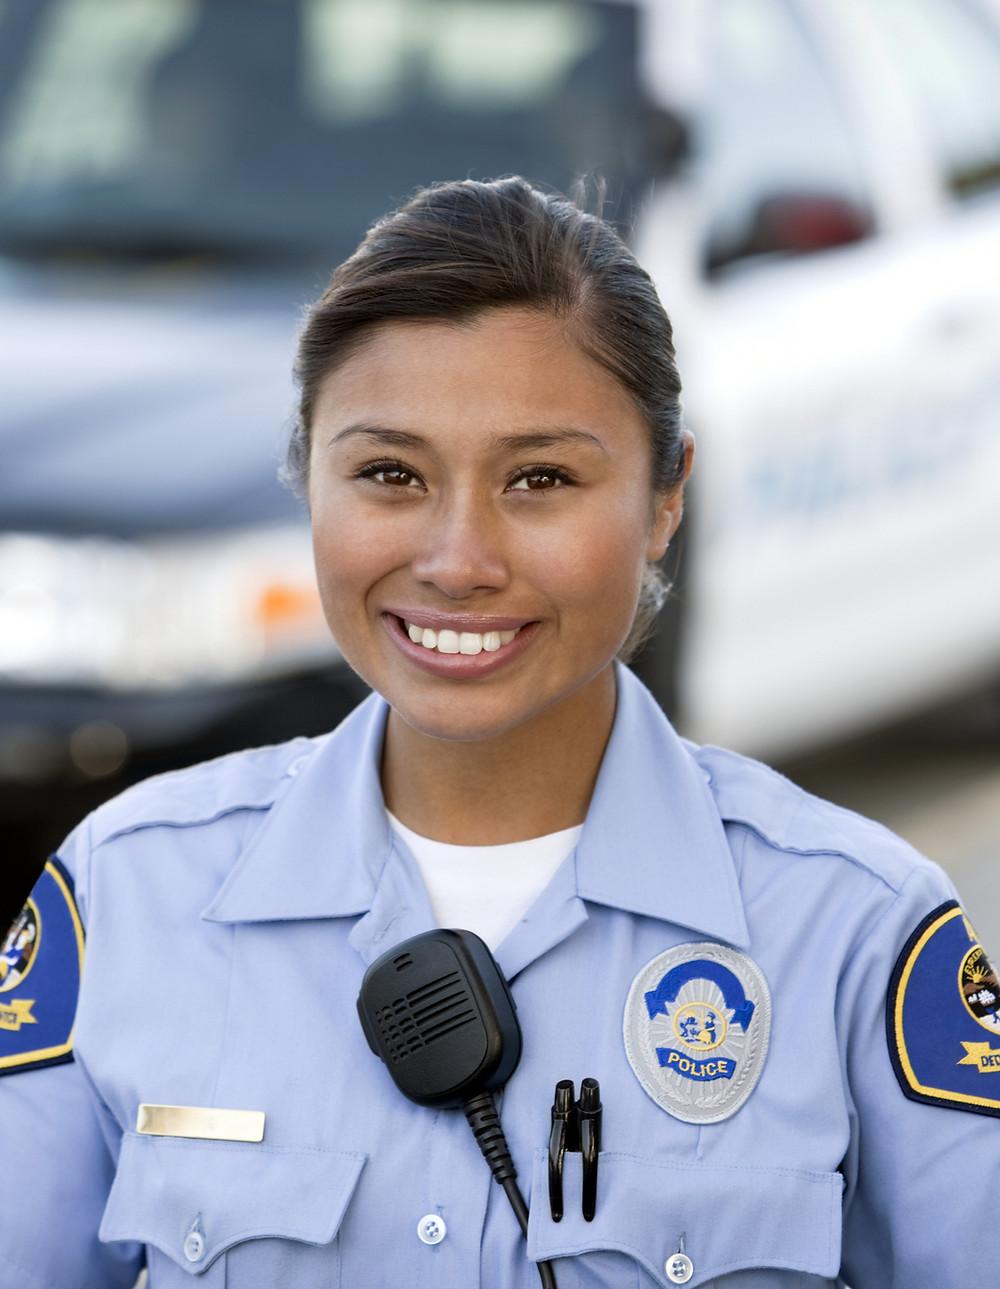 Policewoman